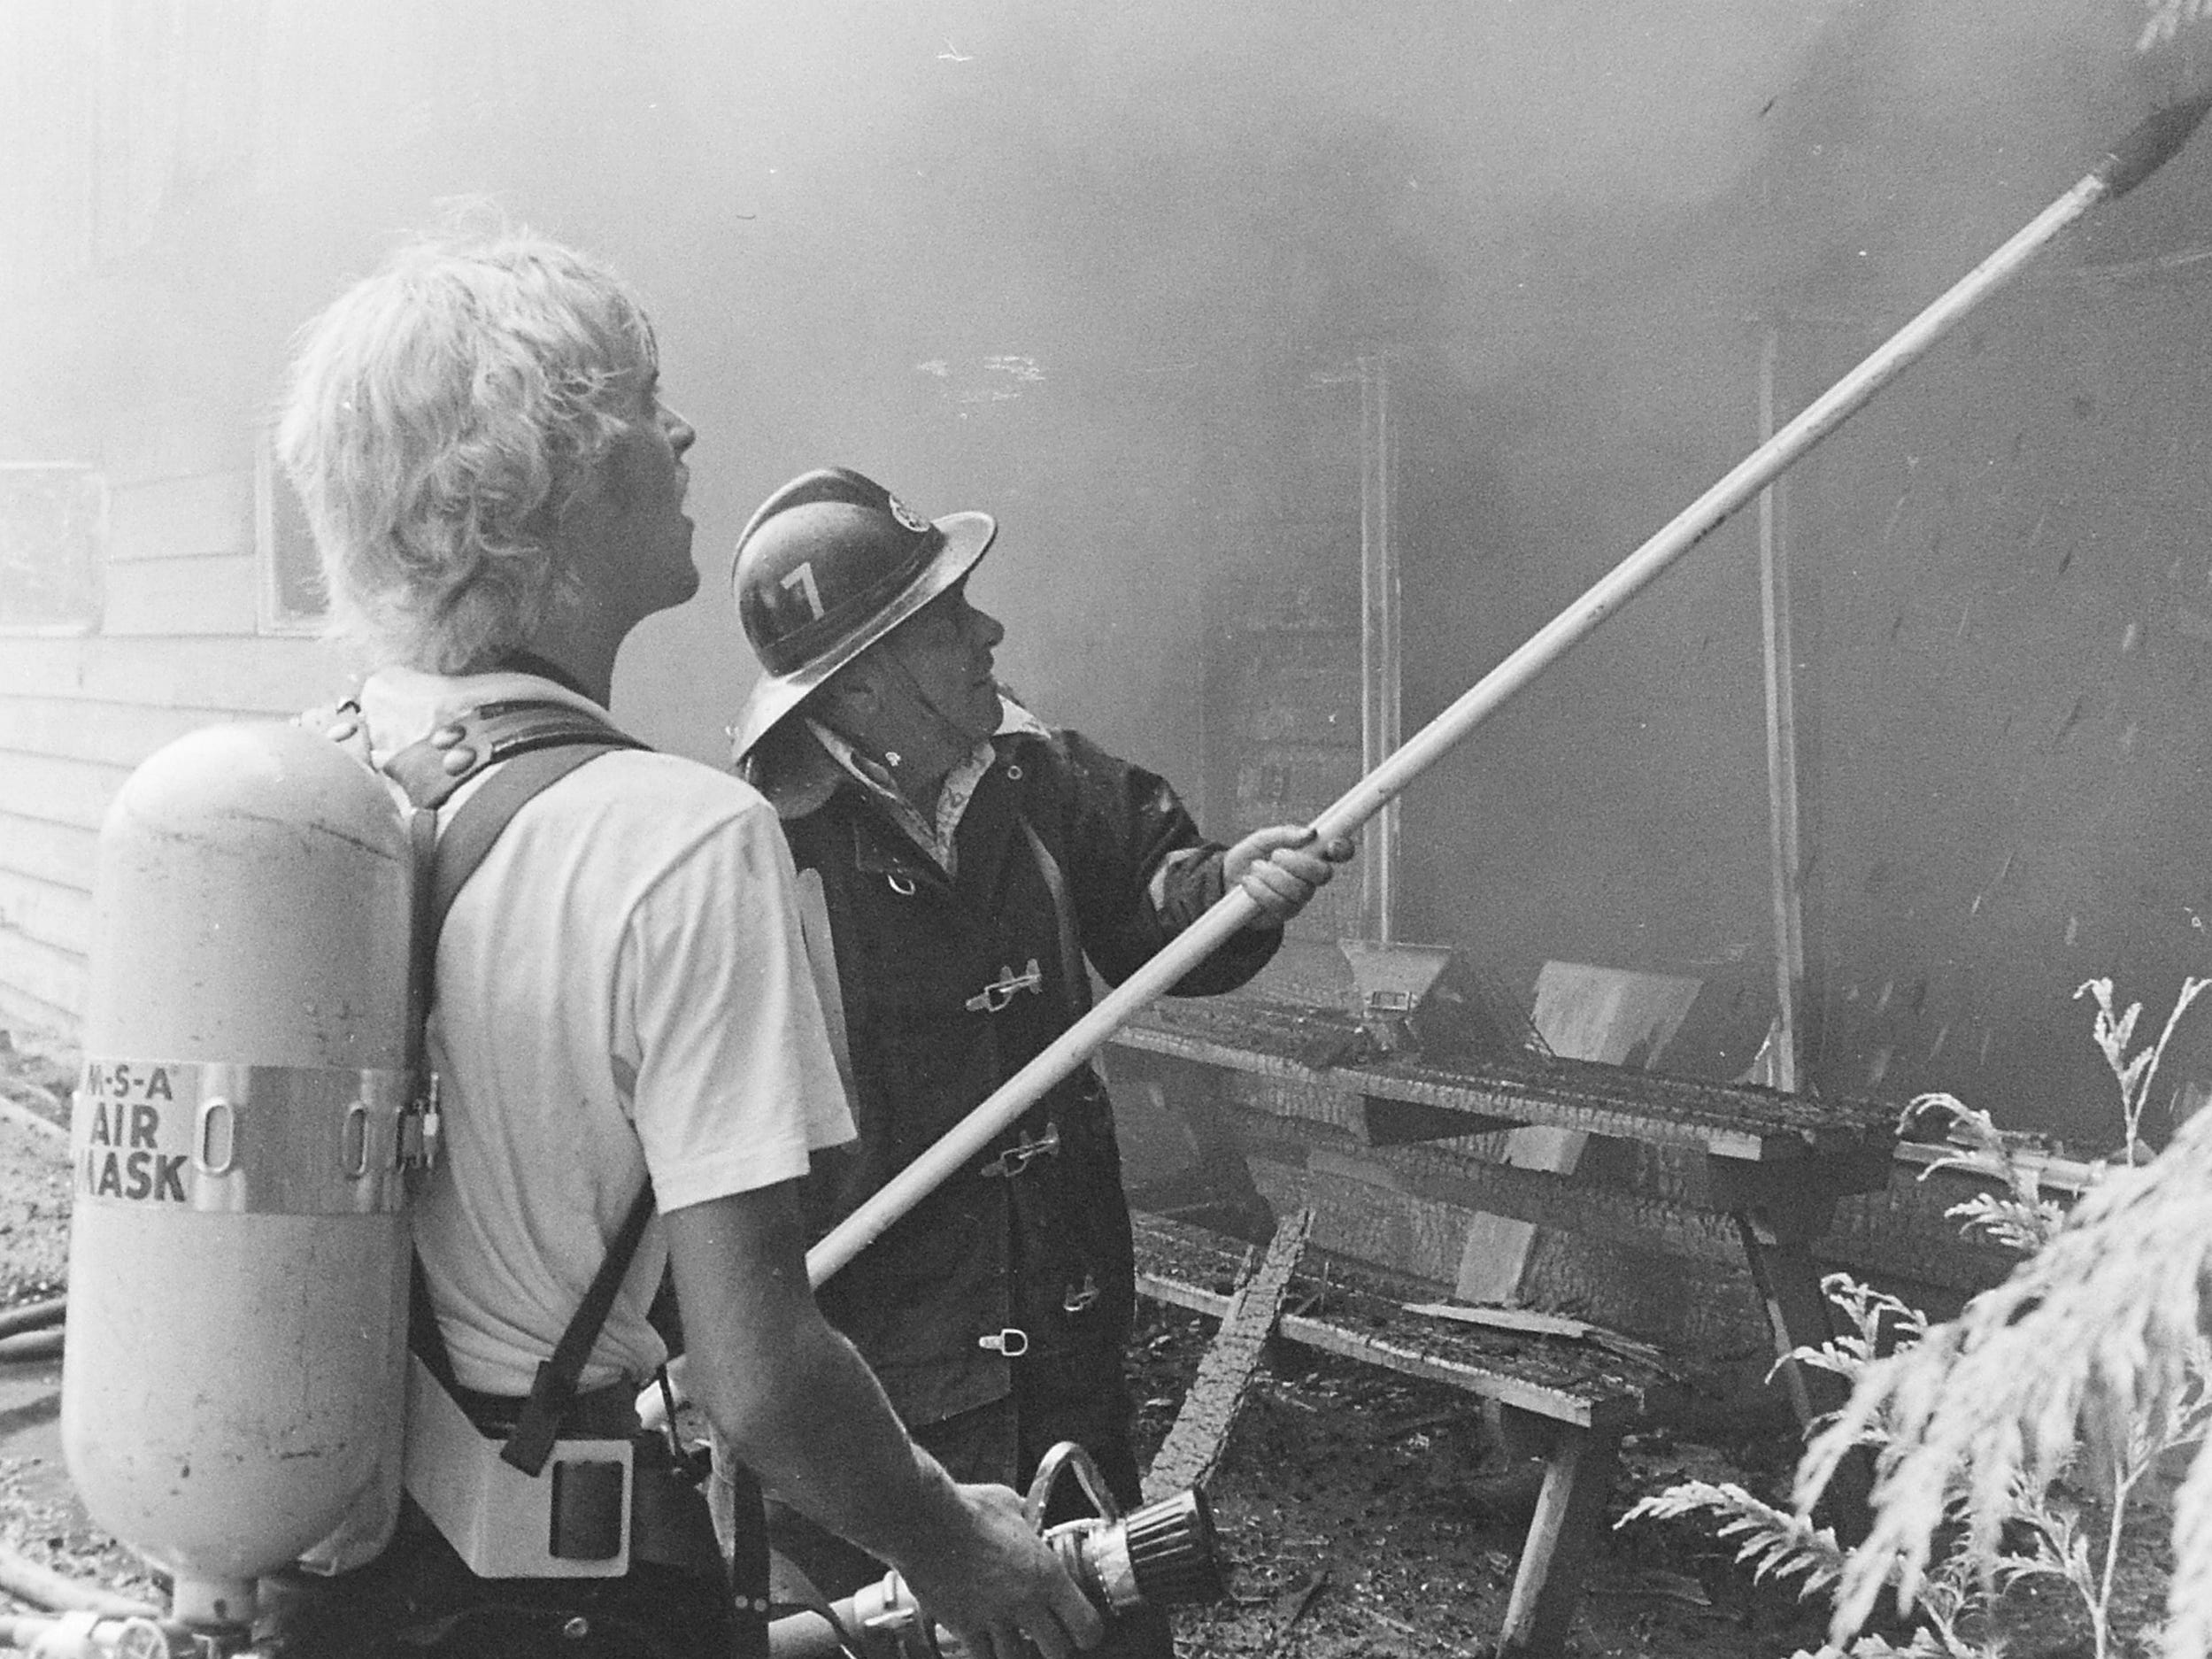 08/02/77House Fire